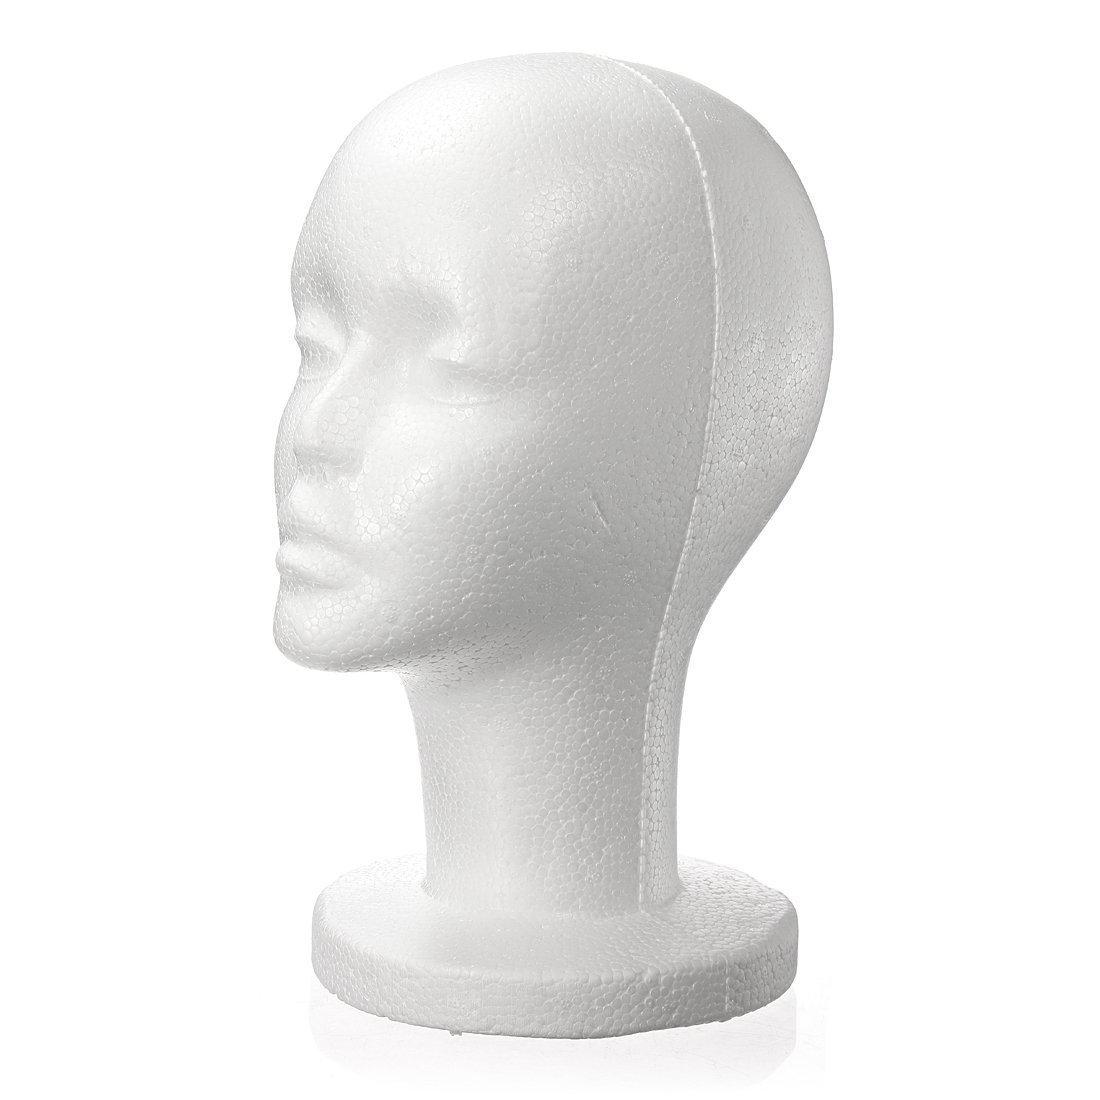 SODIAL(R) Fashion Female White Foam Styrofoam Mannequin Hat Cap Dummy Wig Head display Holder Model